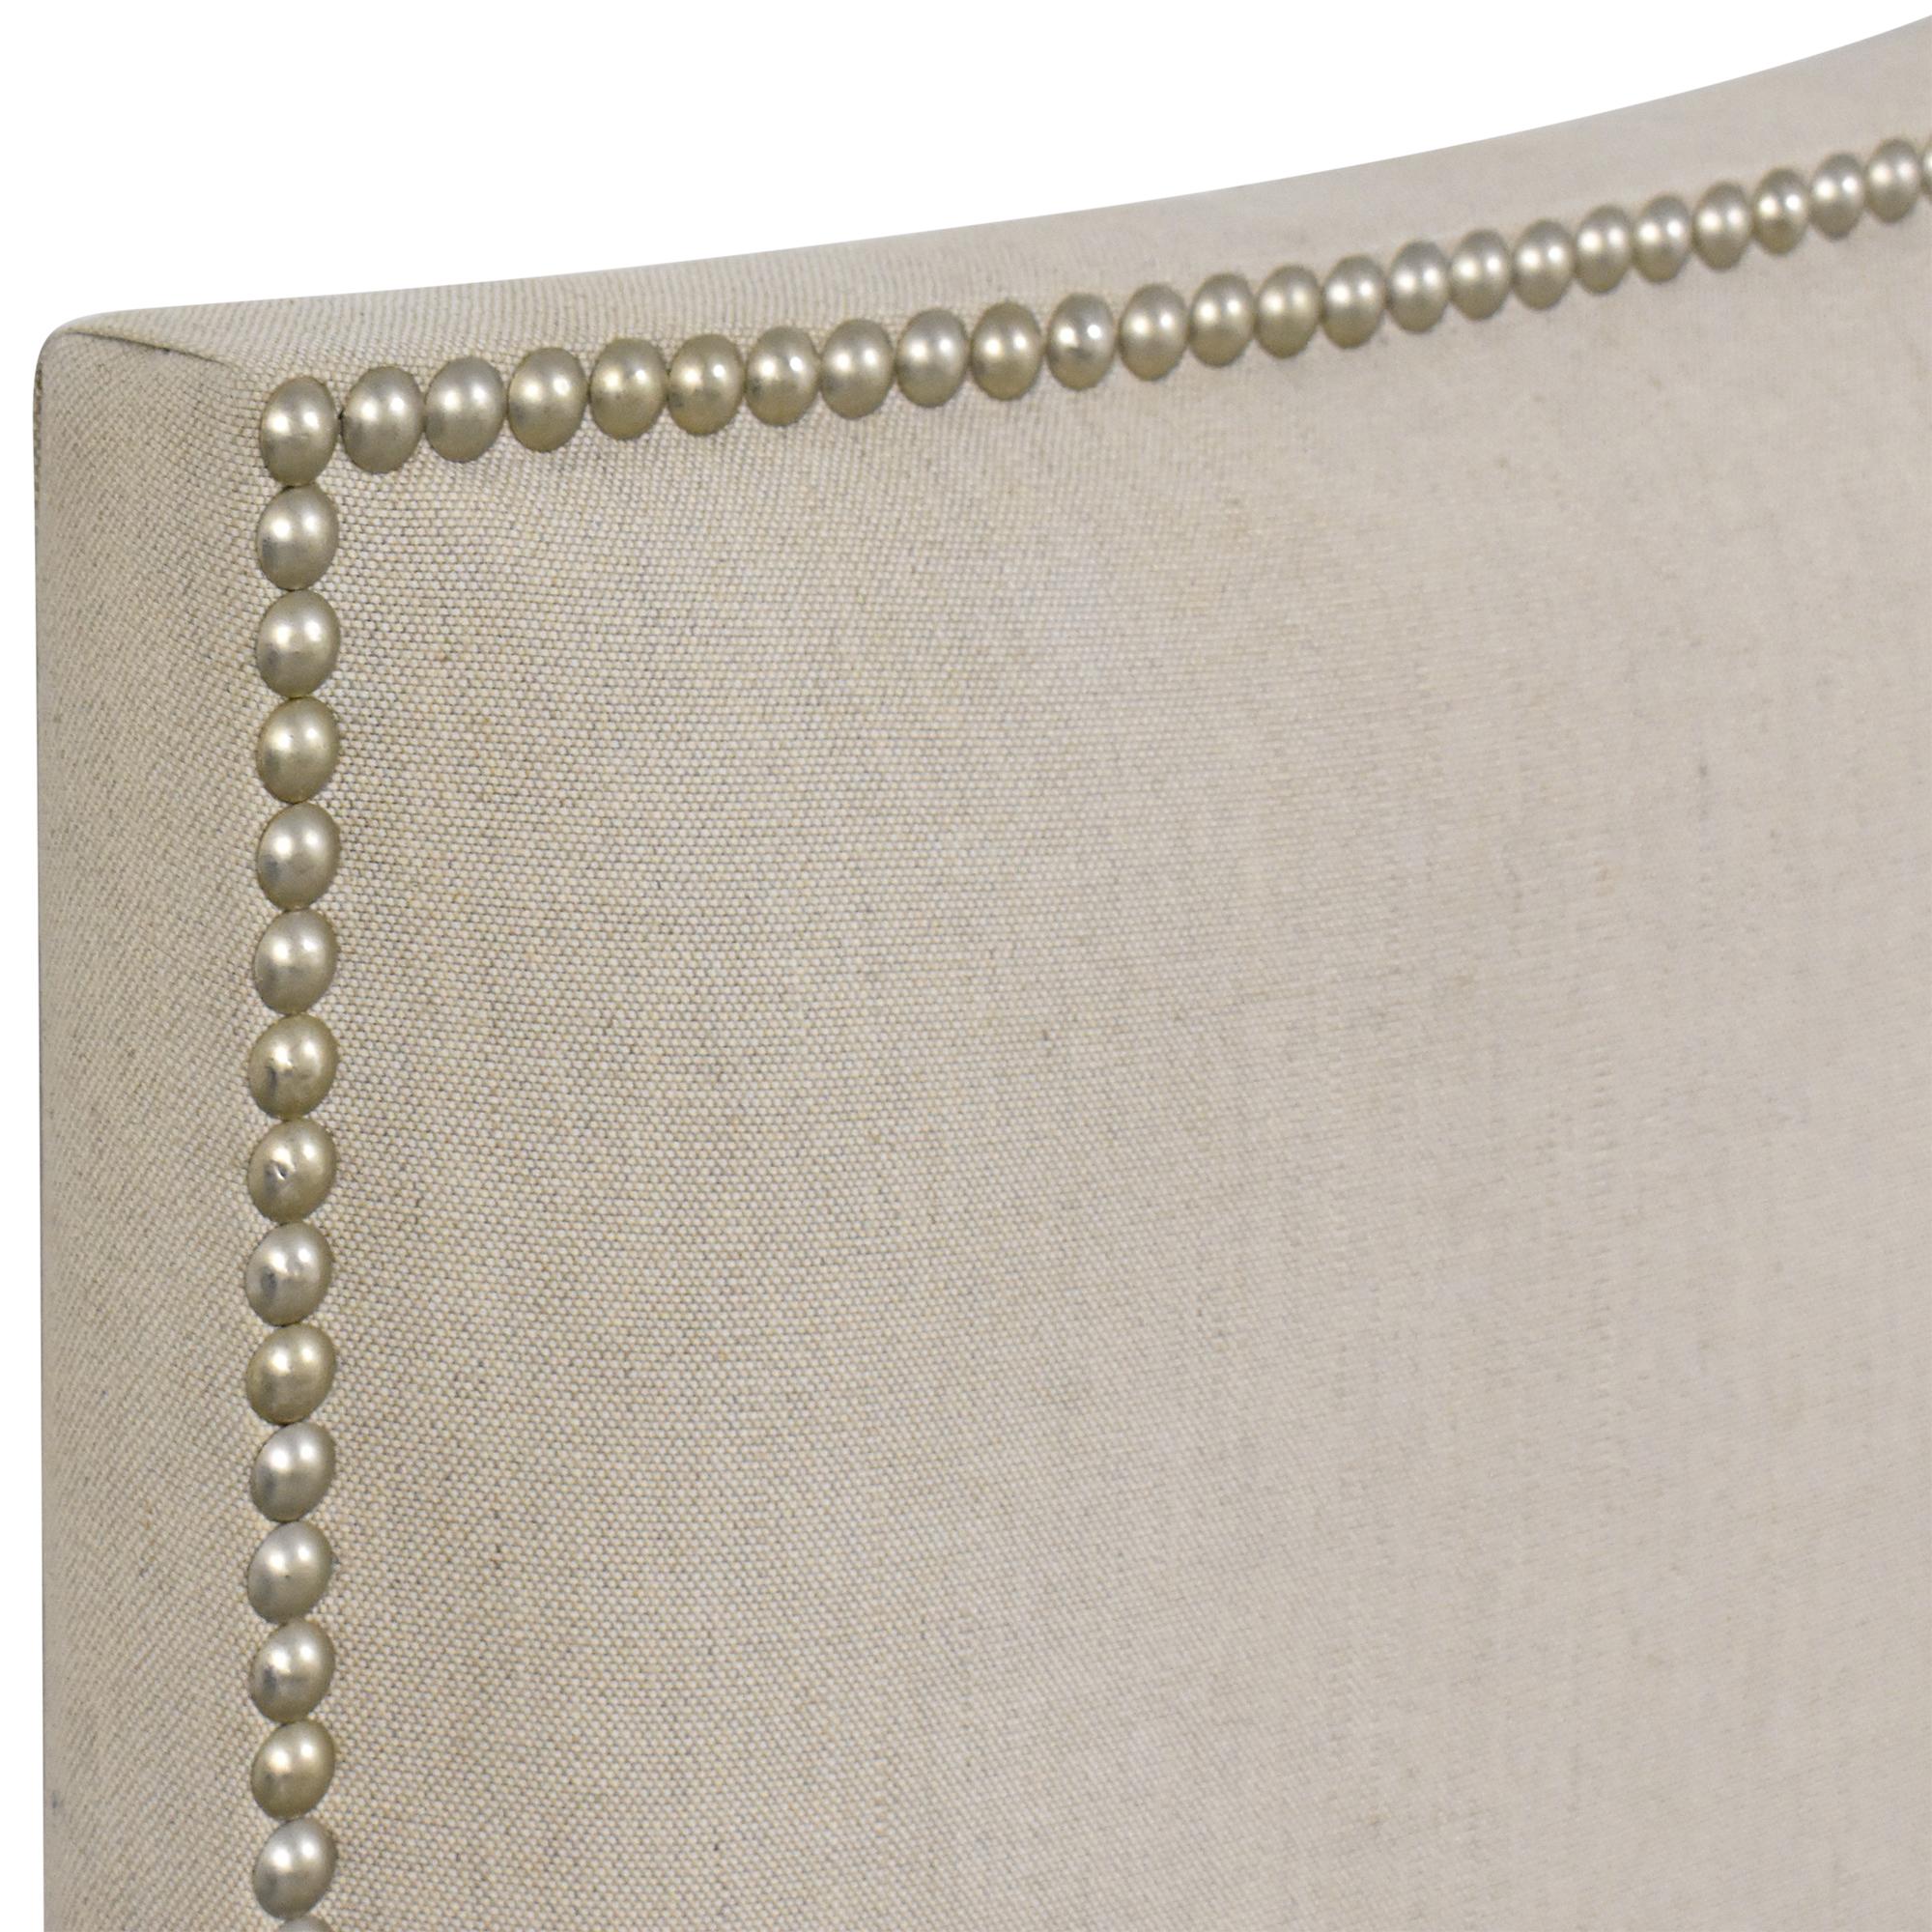 Crate & Barrel Crate & Barrel Colette Upholstered Nailhead King Headboard nyc